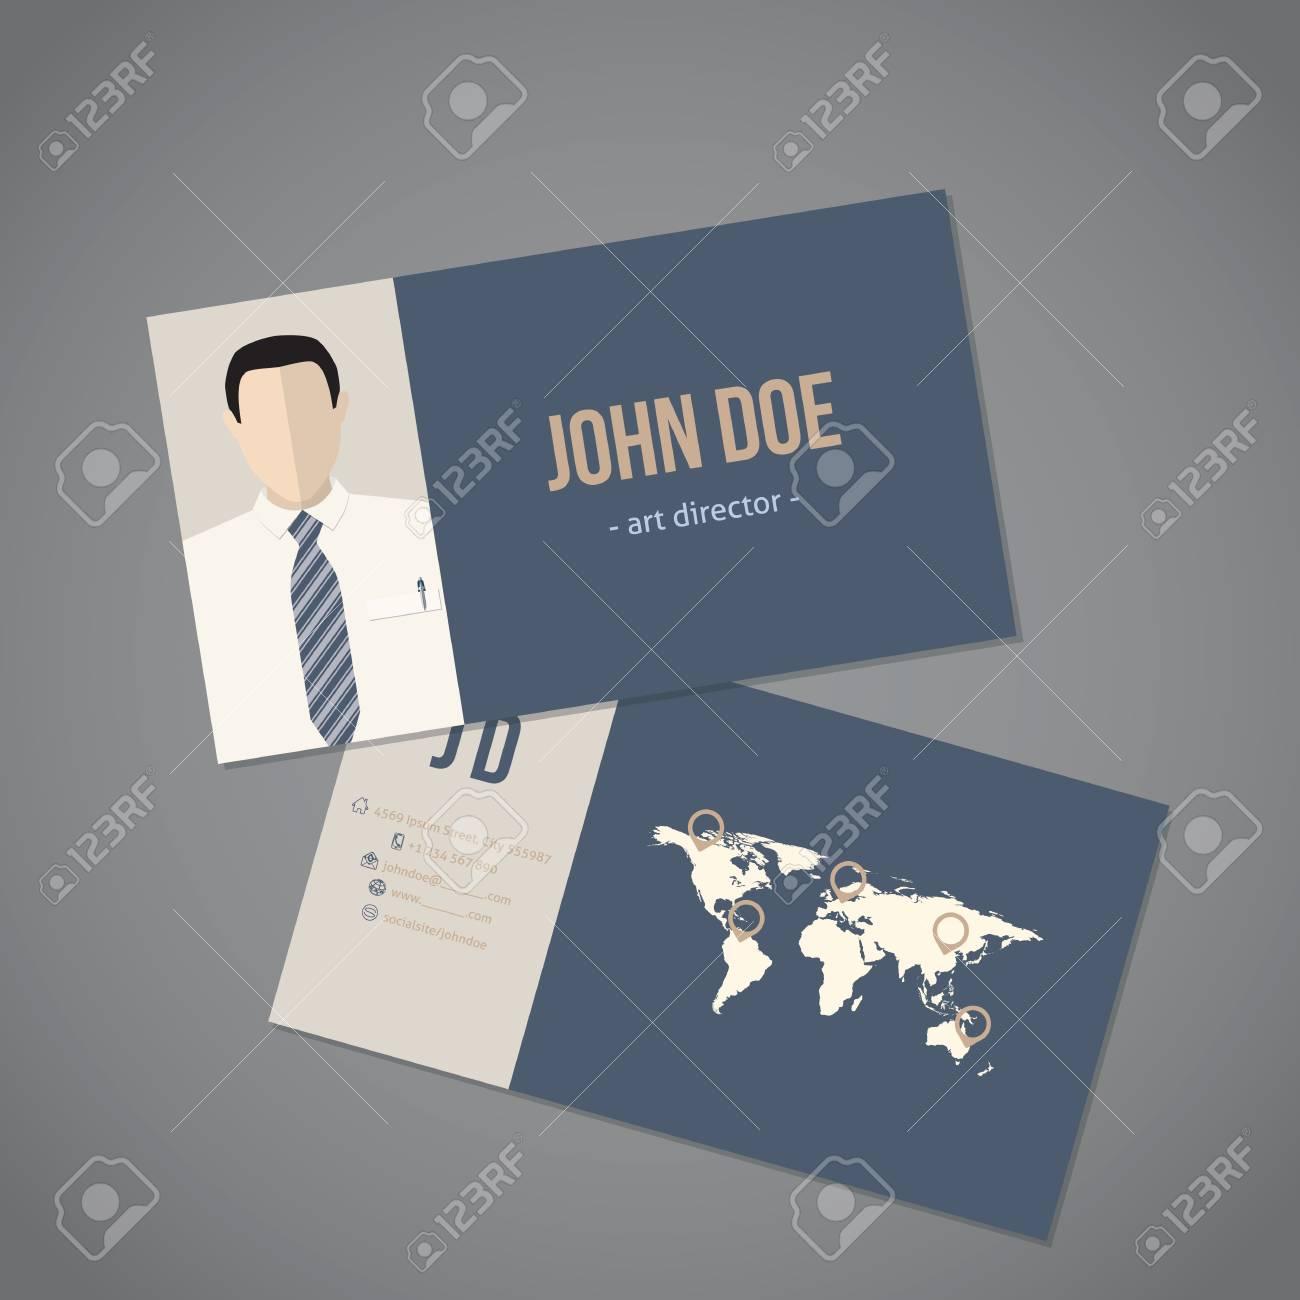 Modern business card with world map design royalty free cliparts modern business card with world map design stock vector 53173453 colourmoves